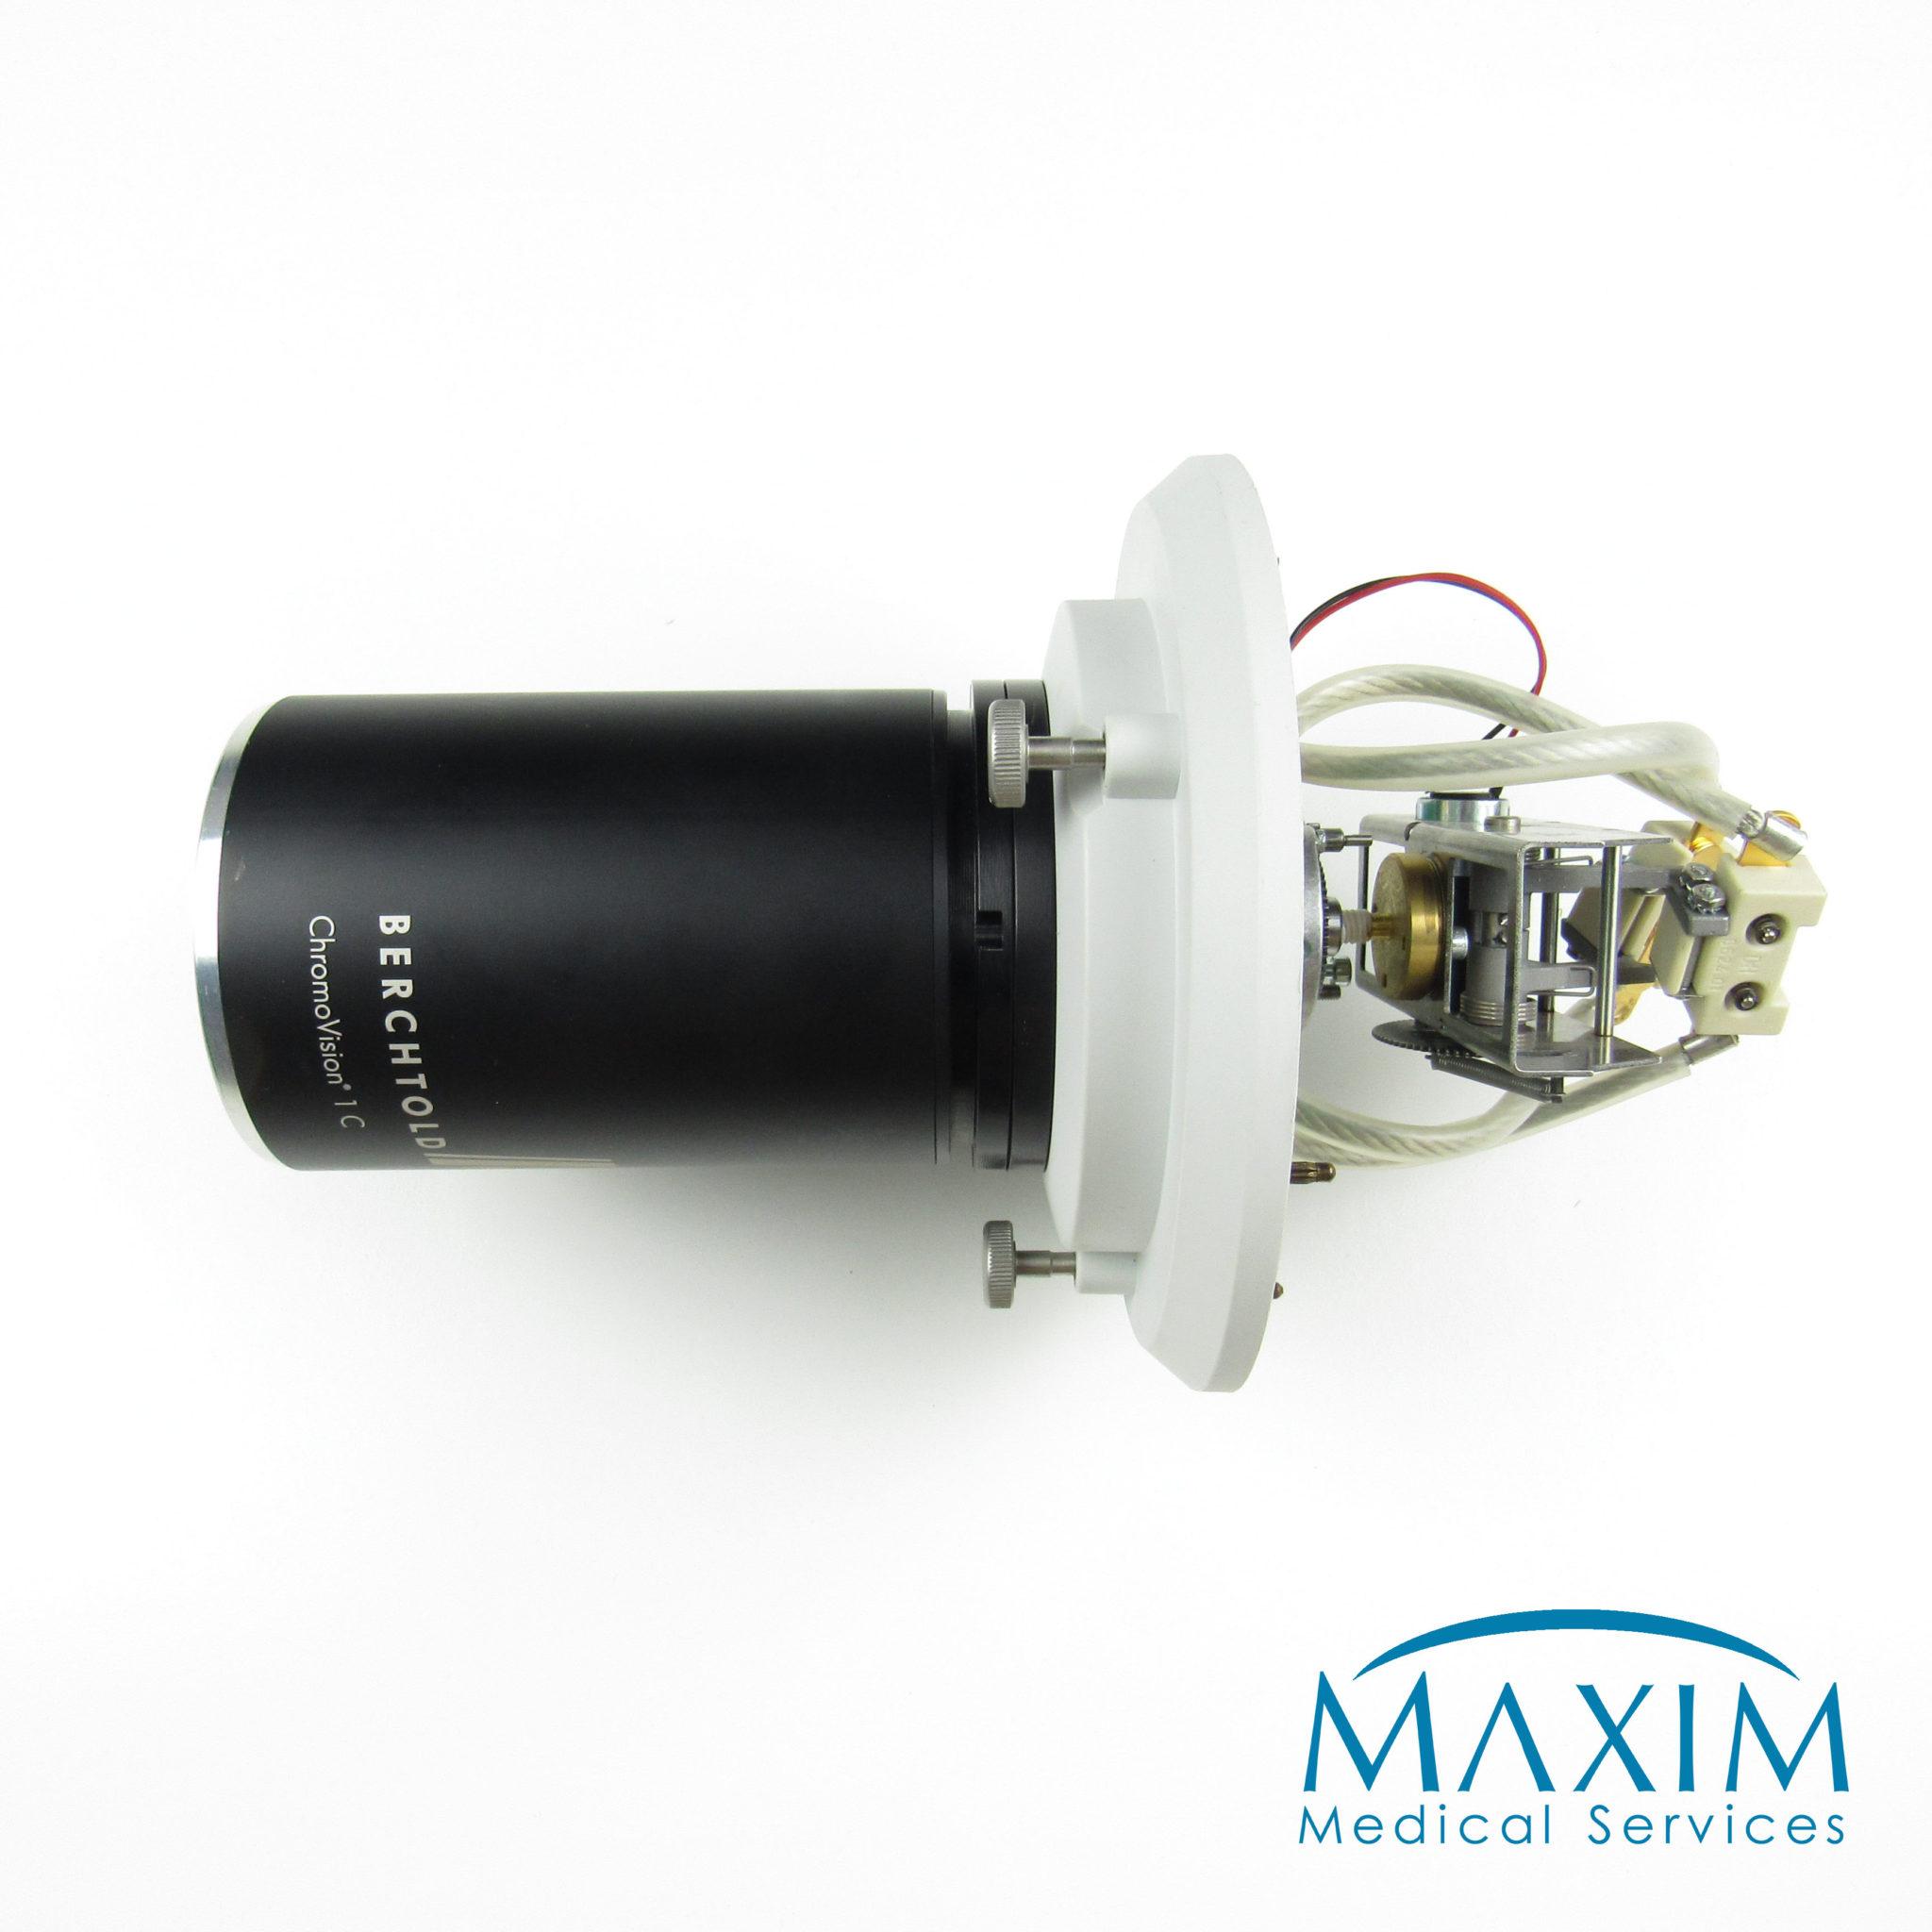 Berchtold Chromovision 1C In-Light Camera